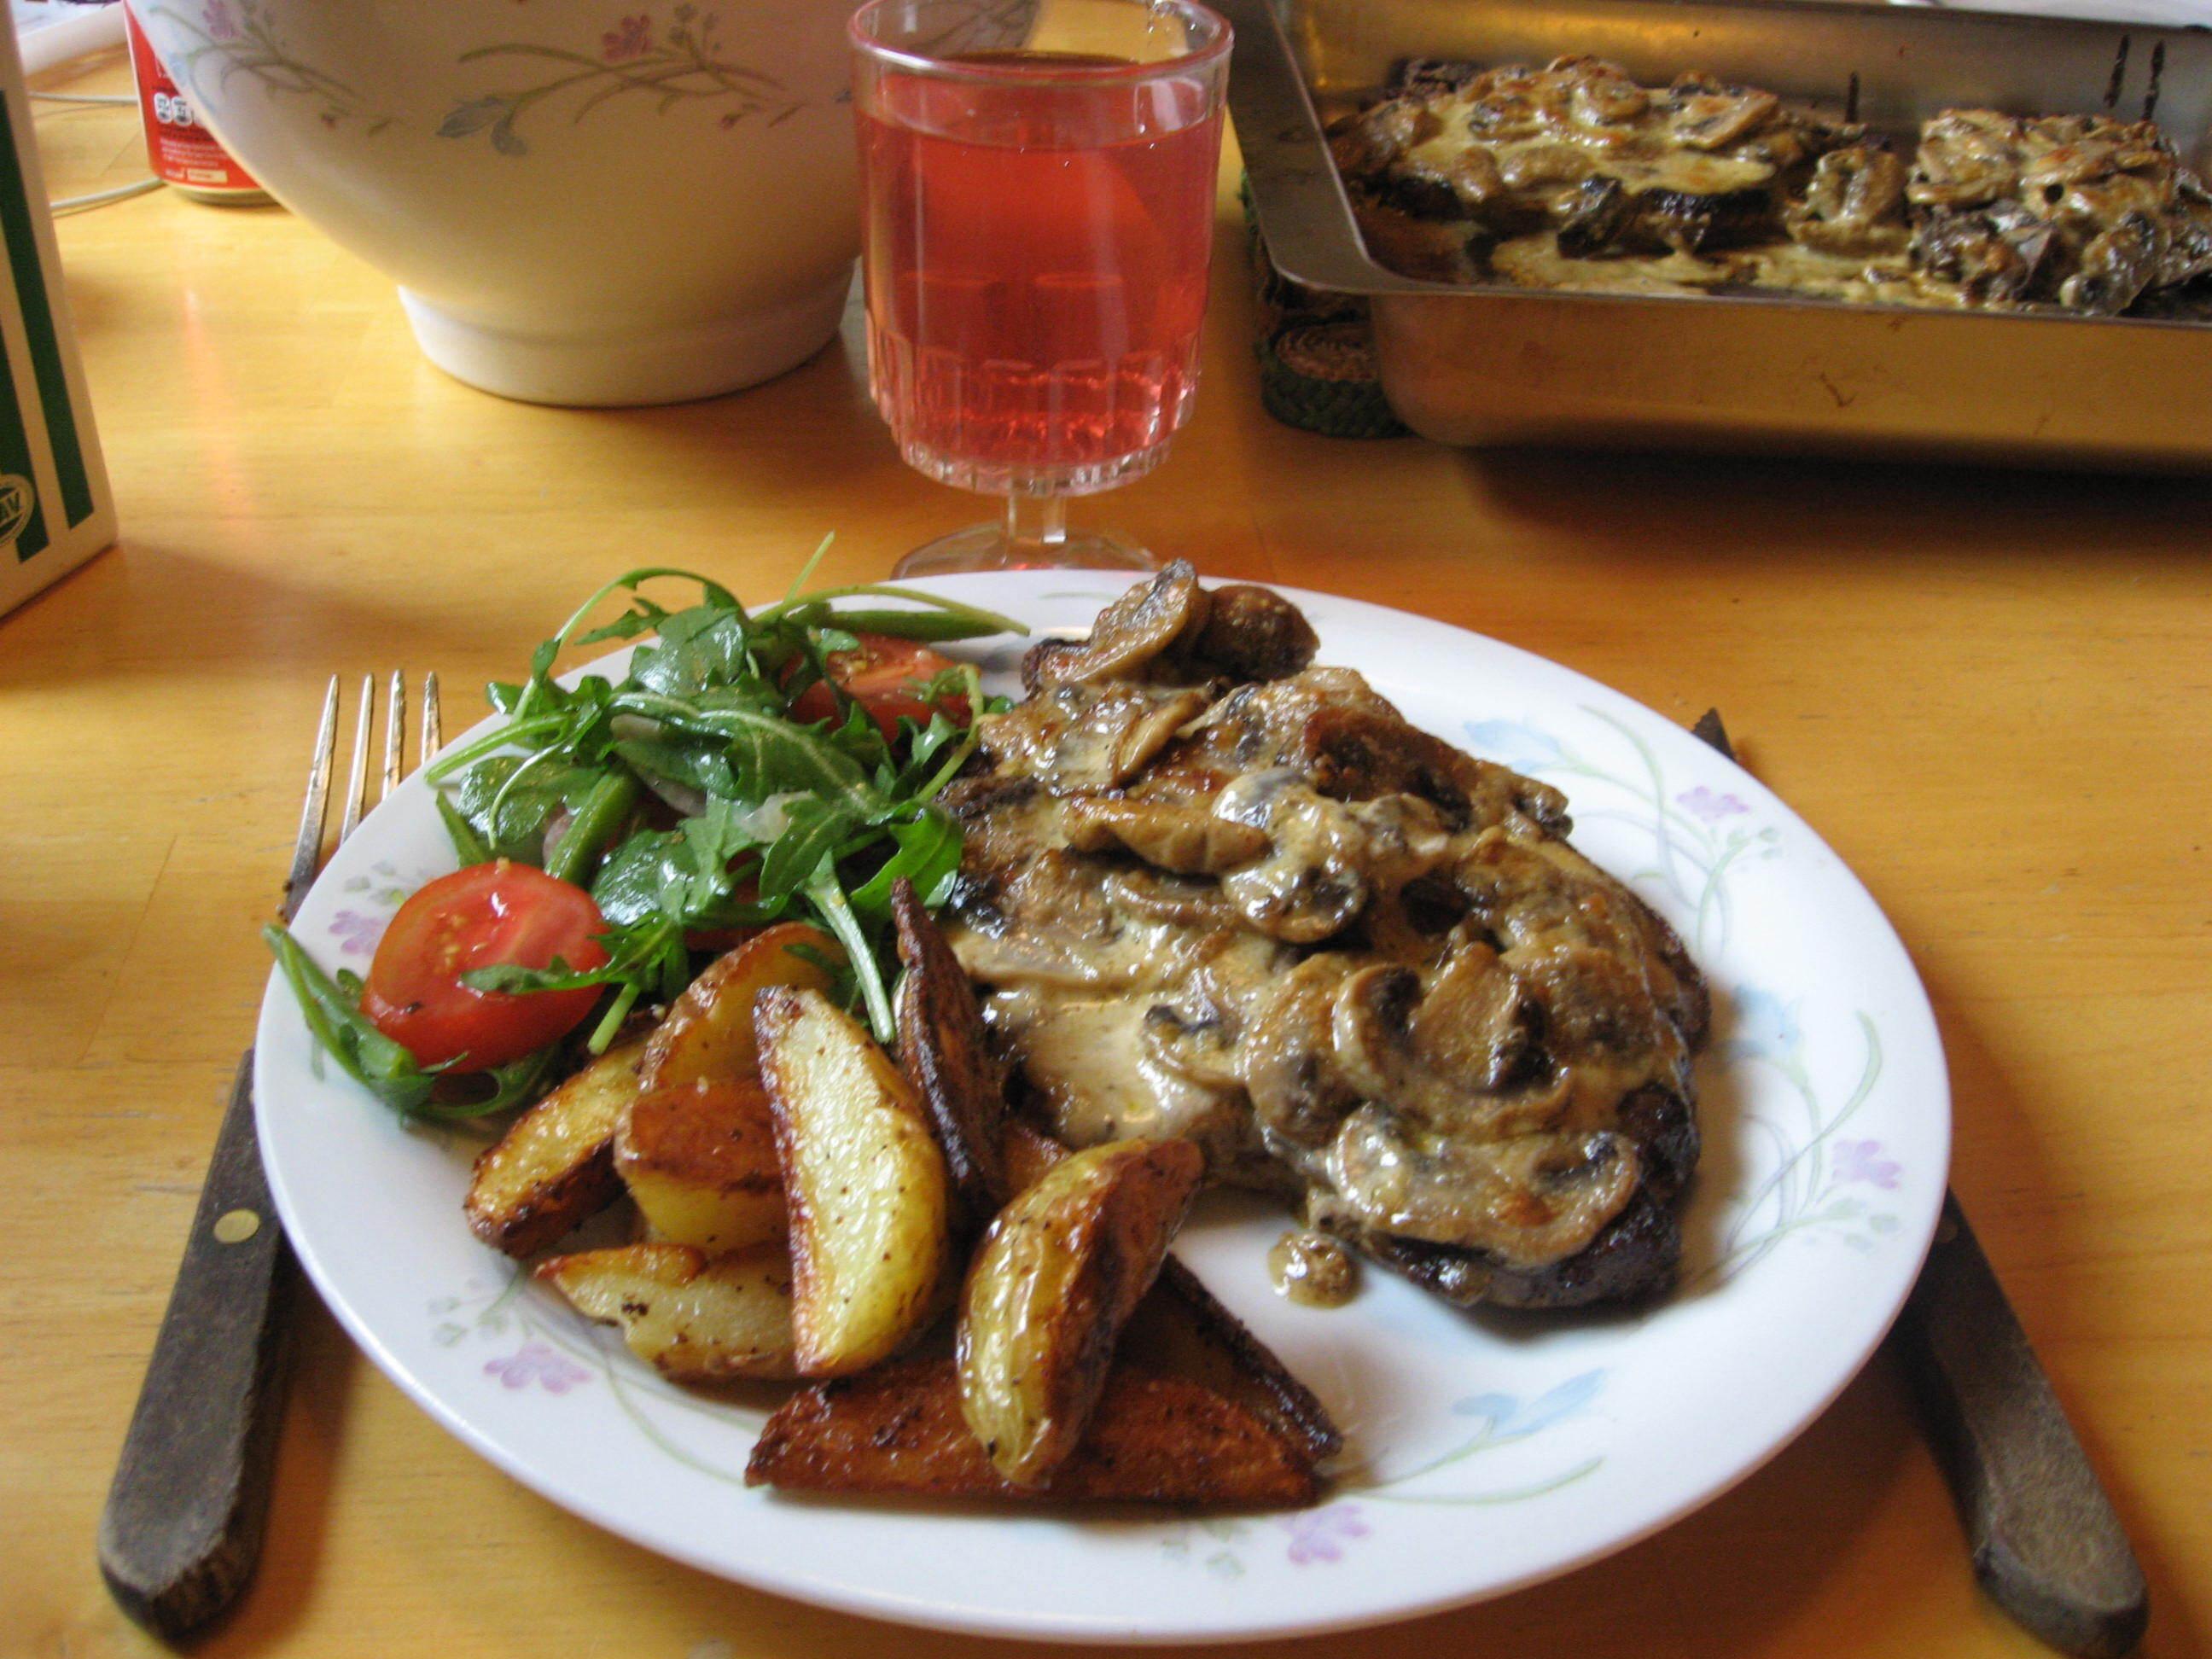 karre stek